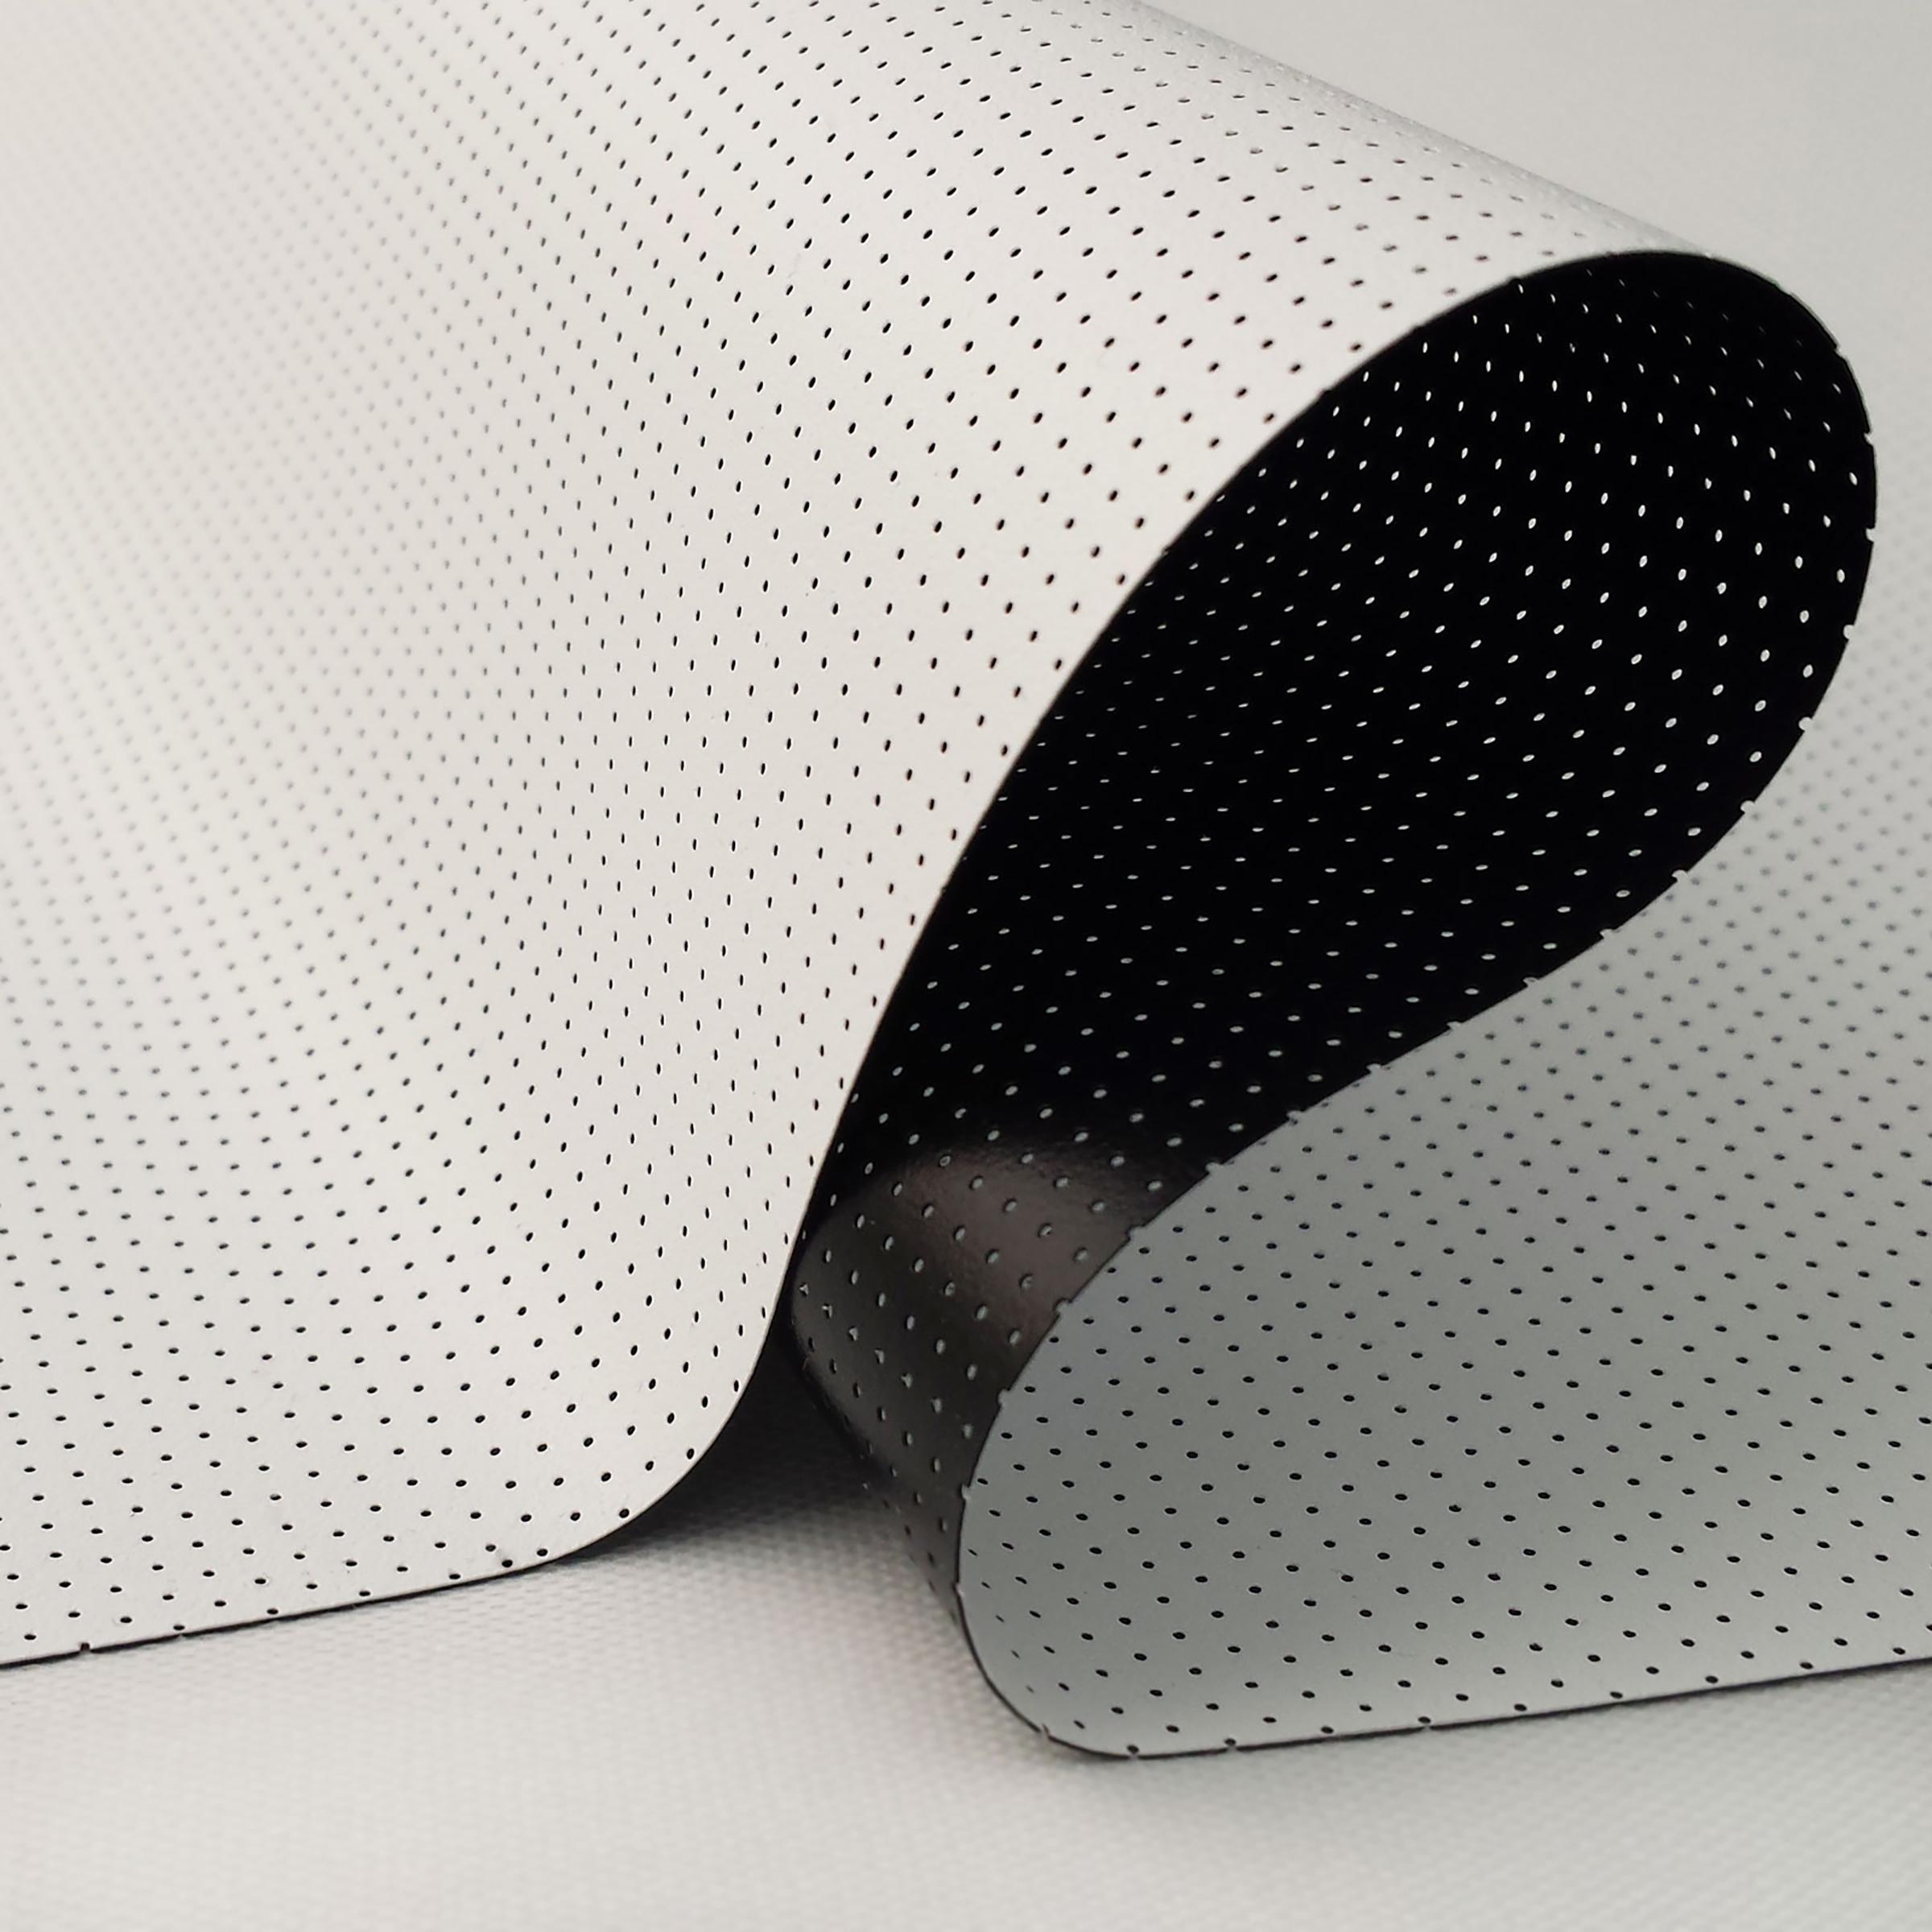 Nano FlexiWhite Projector Screen Material